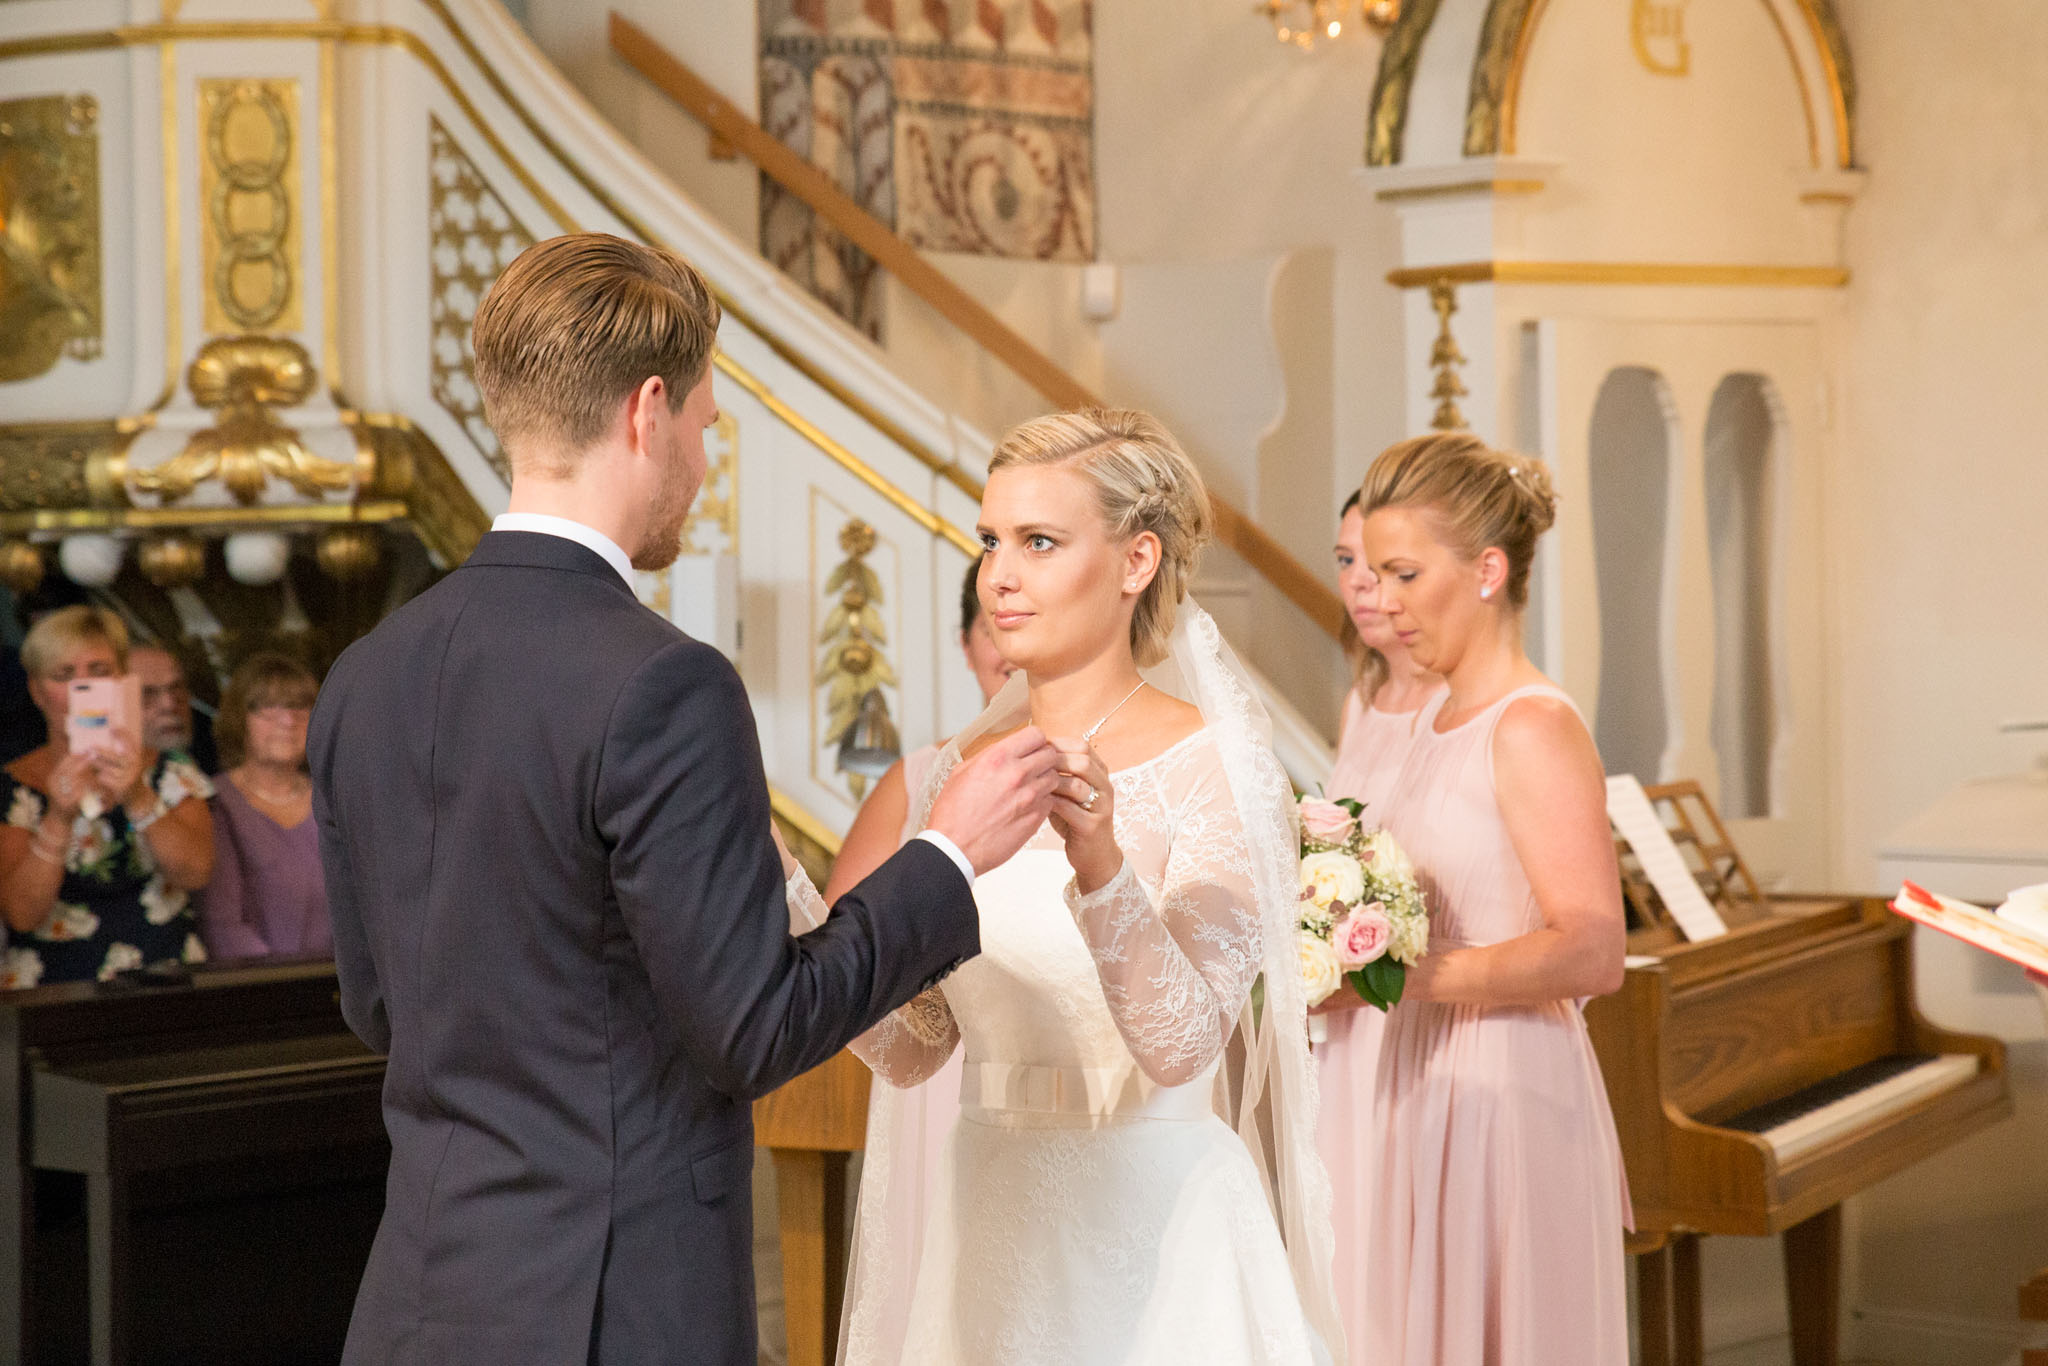 fotograf sabina wixner hudiksvall bröllop 3.jpg